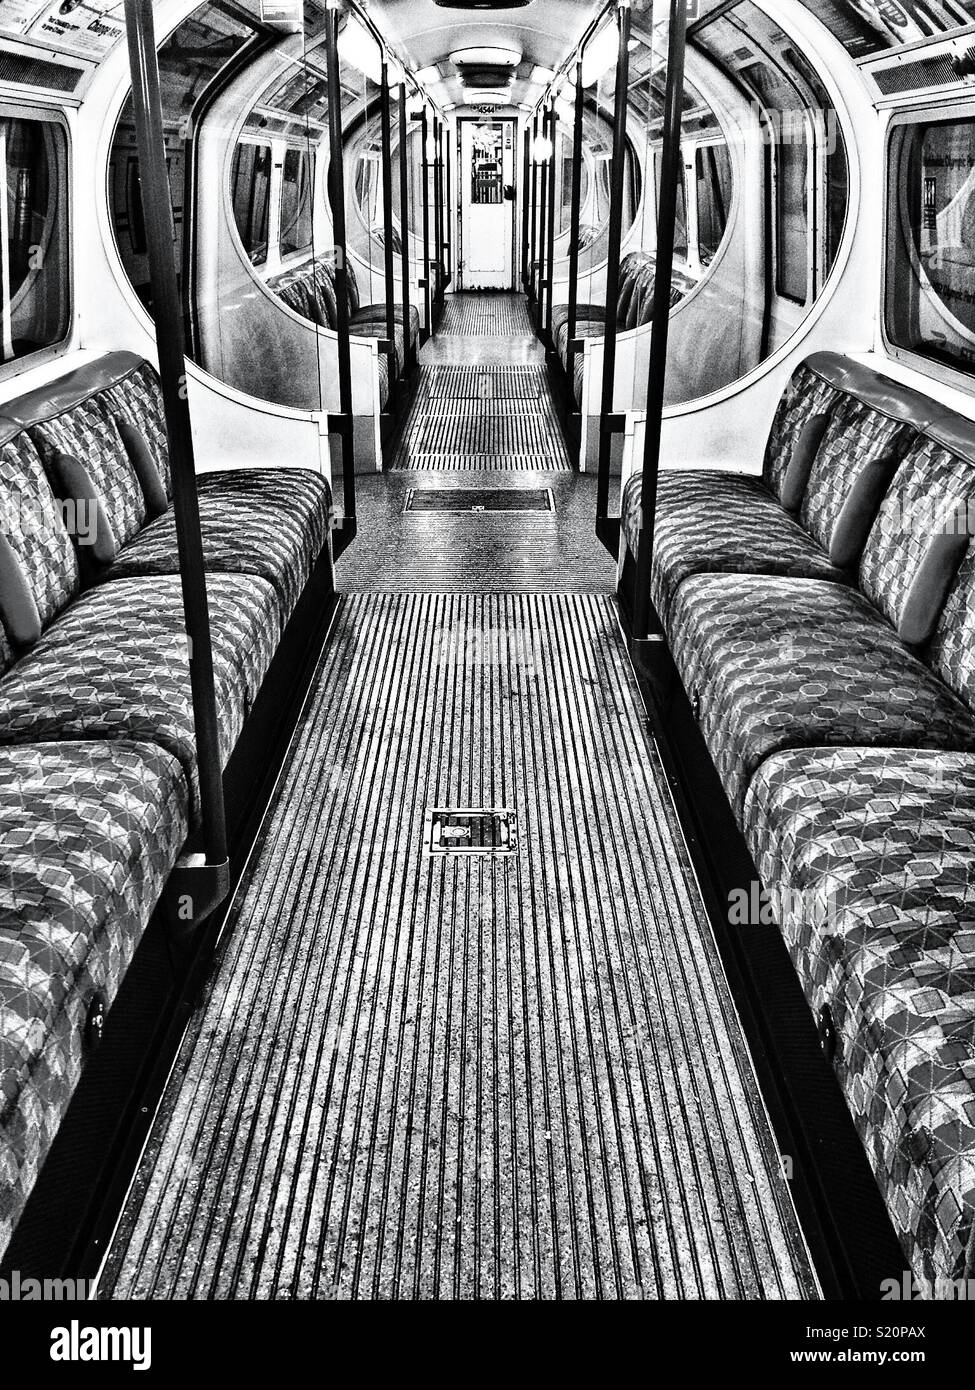 Night tube - Stock Image